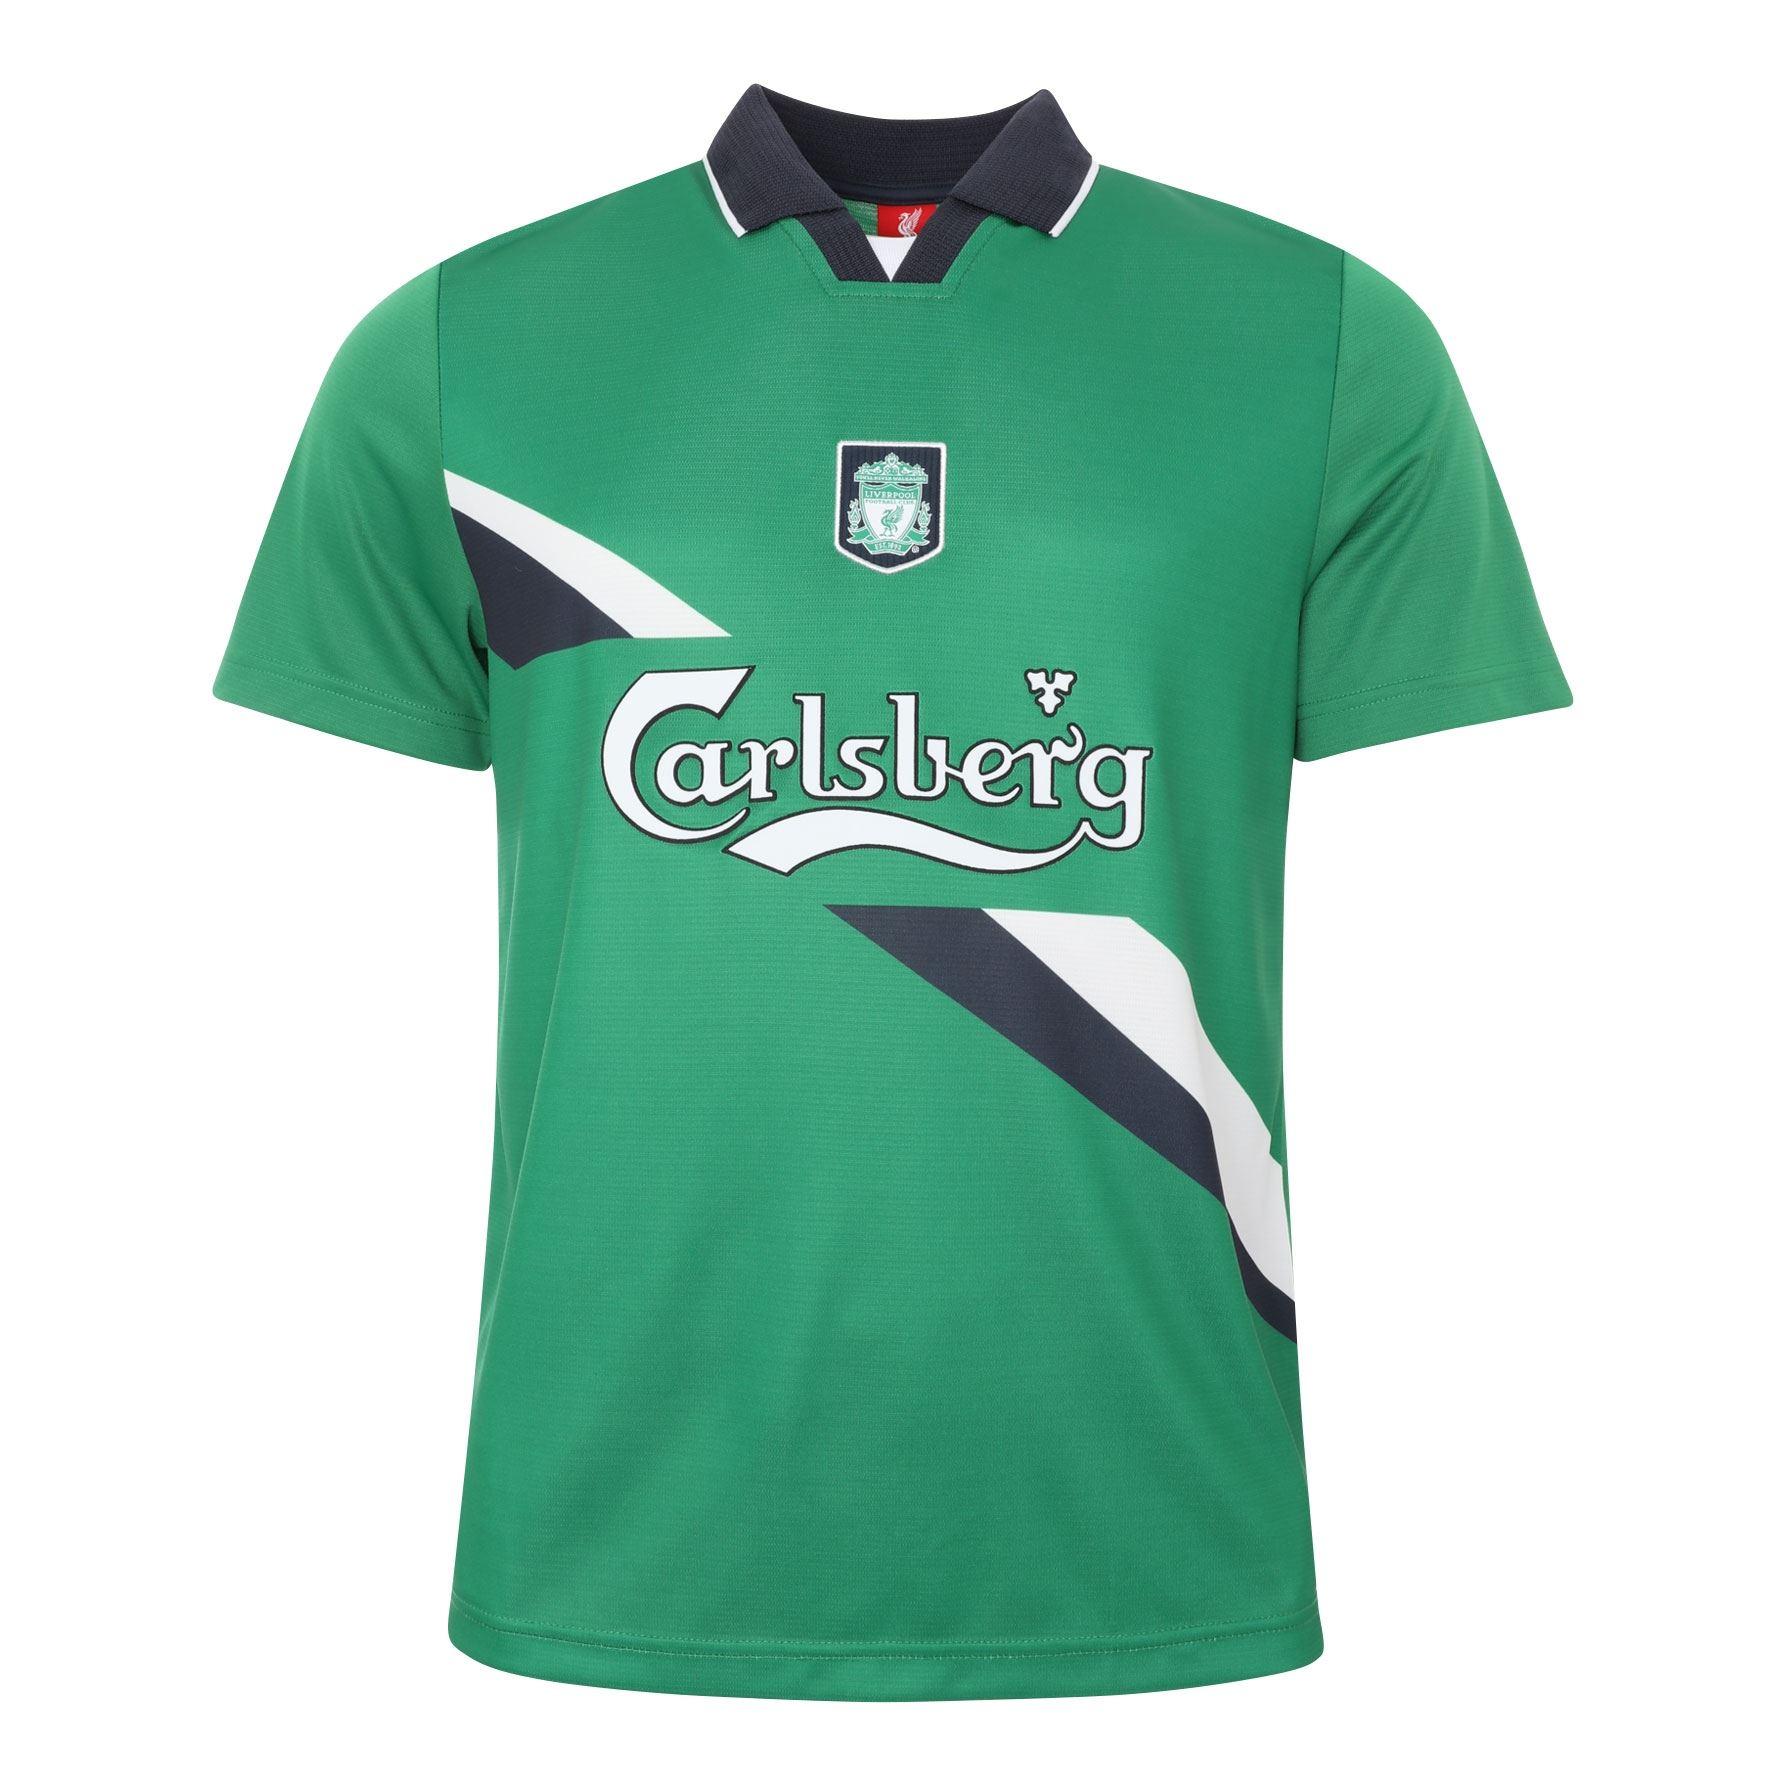 1991 92 Liverpool Away Shirt XL for sale